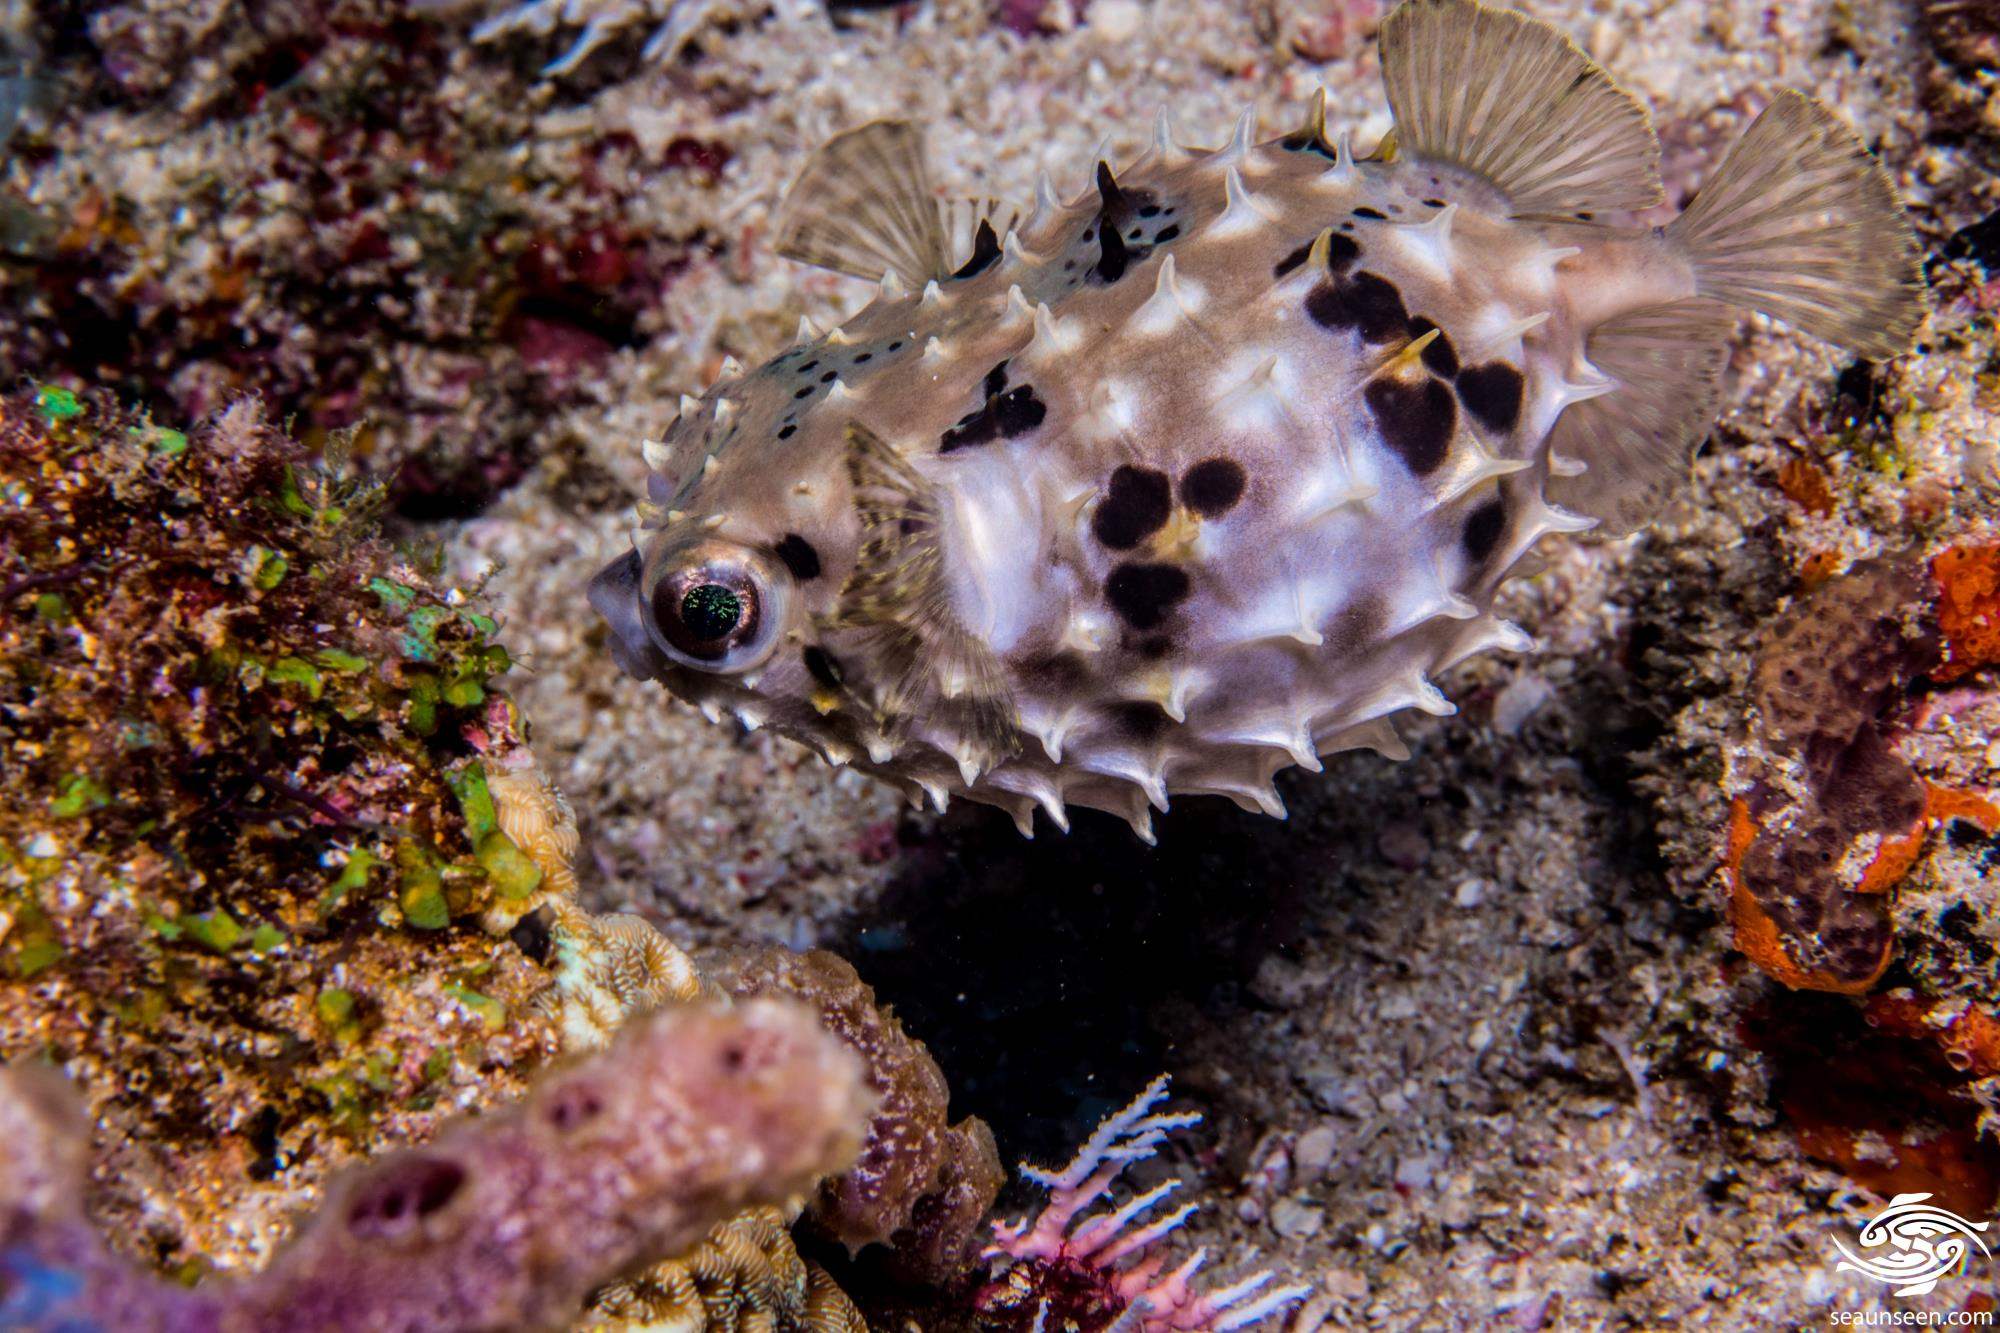 Birdbeak Burrfish Cyclichthys orbicularis is also known as the Orbicular Burrfish